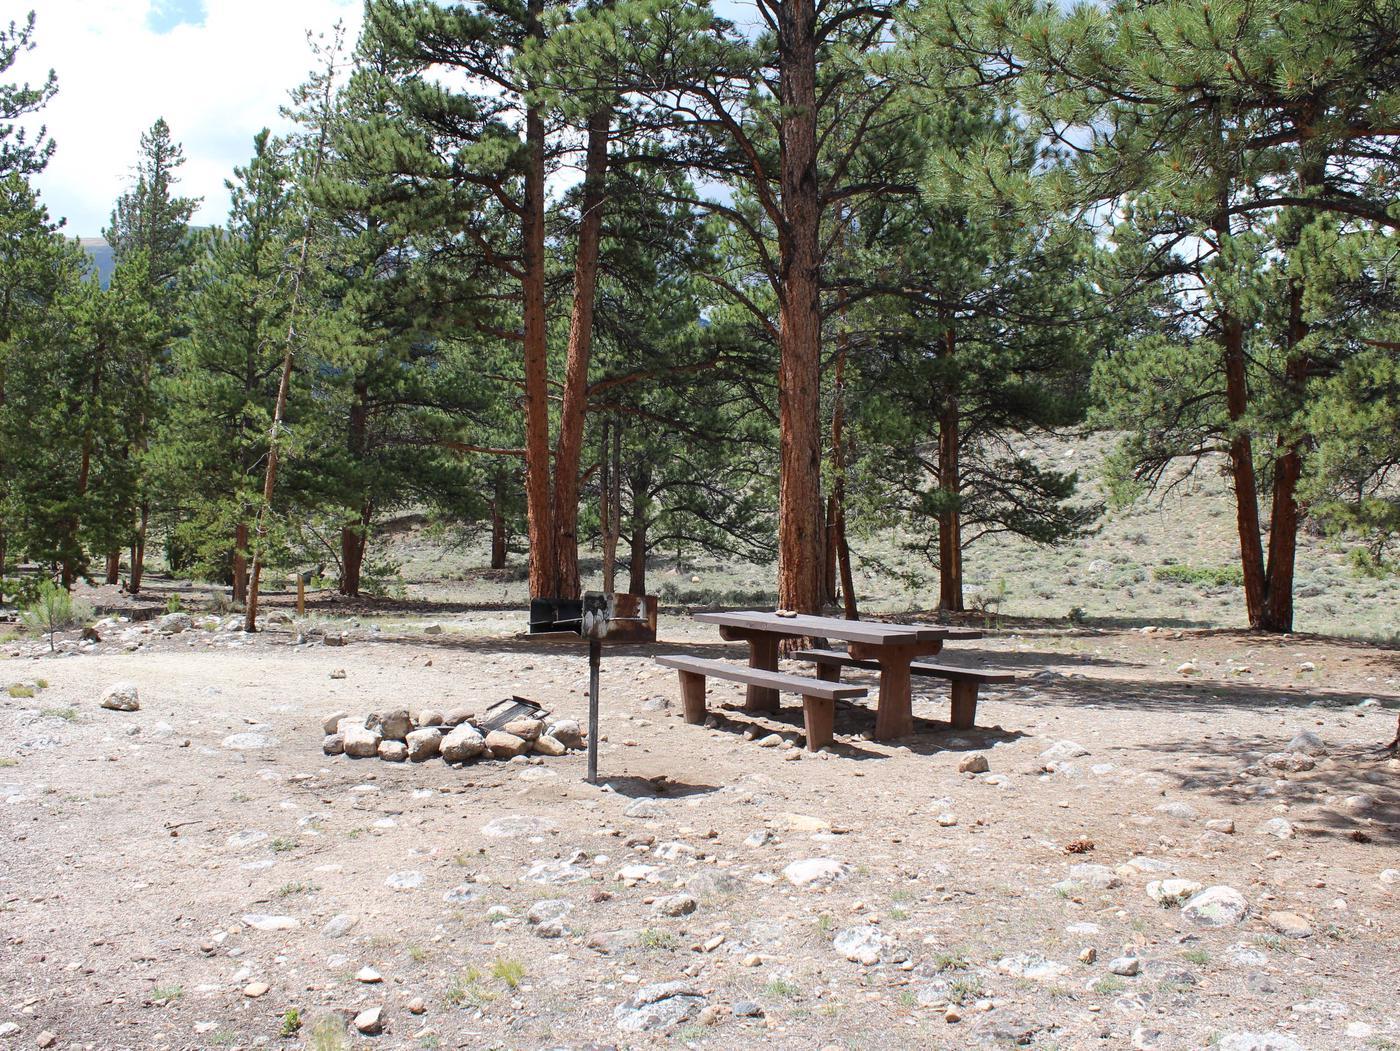 White Star Campground, site 64